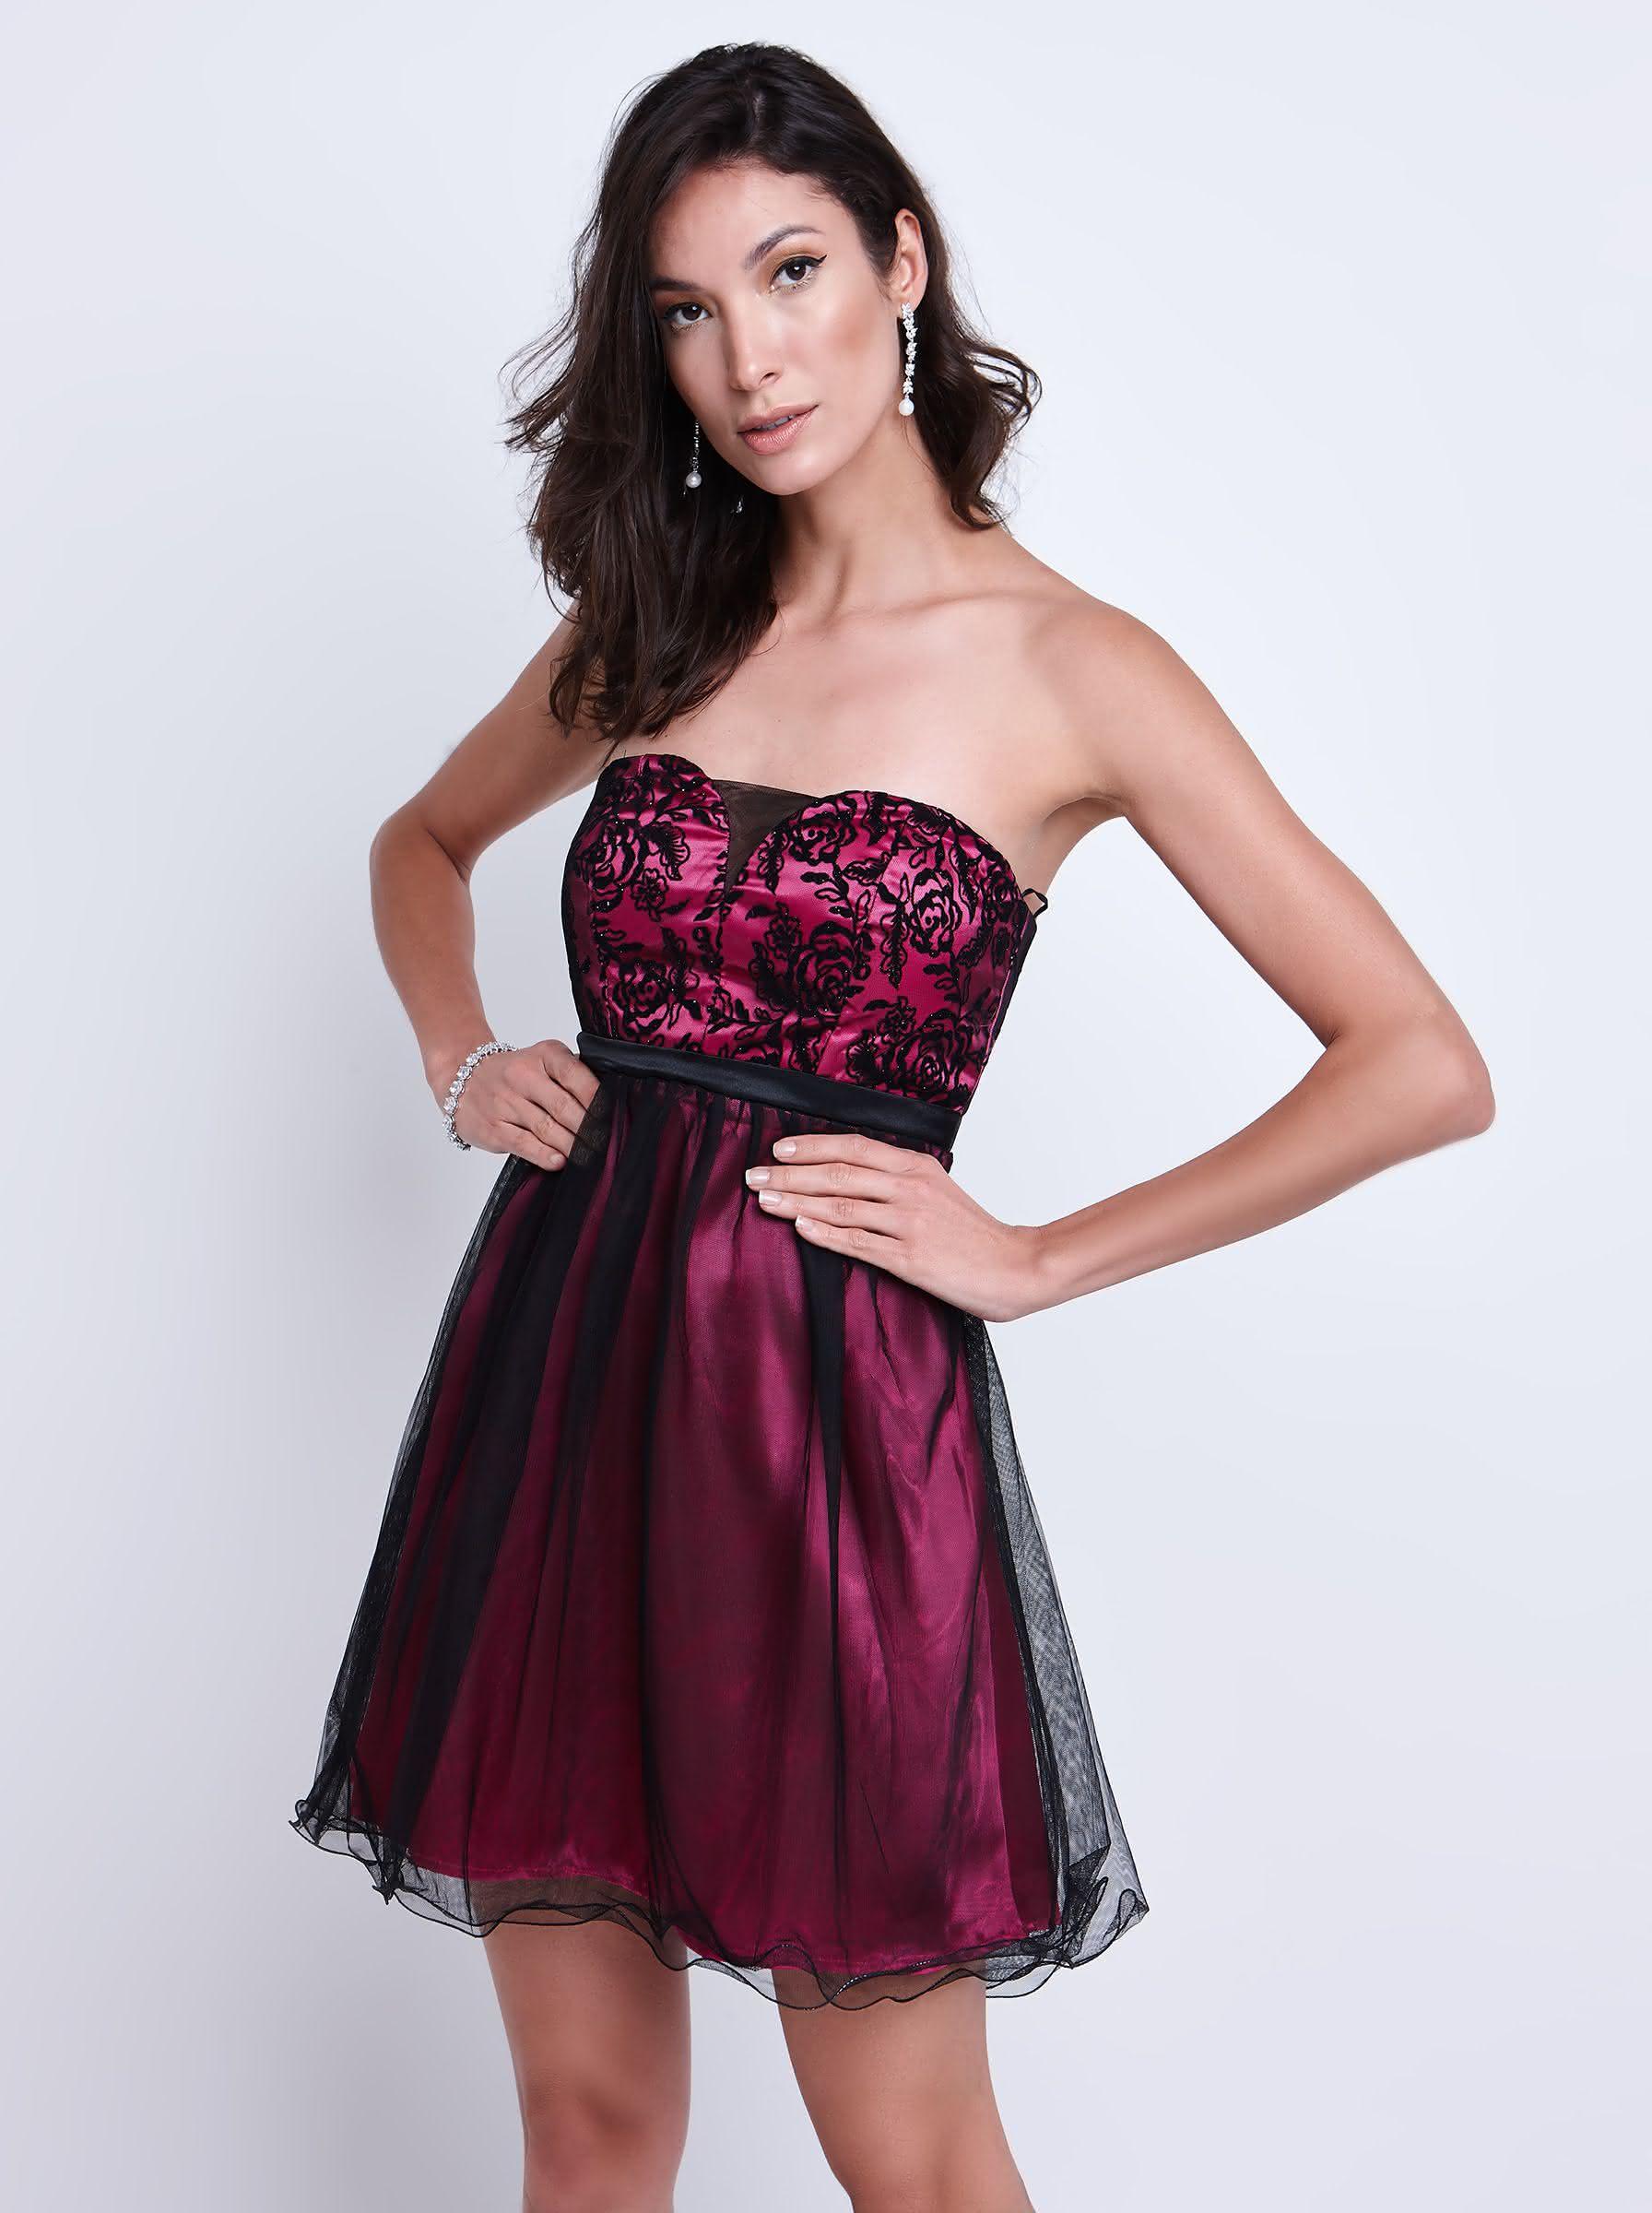 Vestidos-Curtos-para-Festa-2019